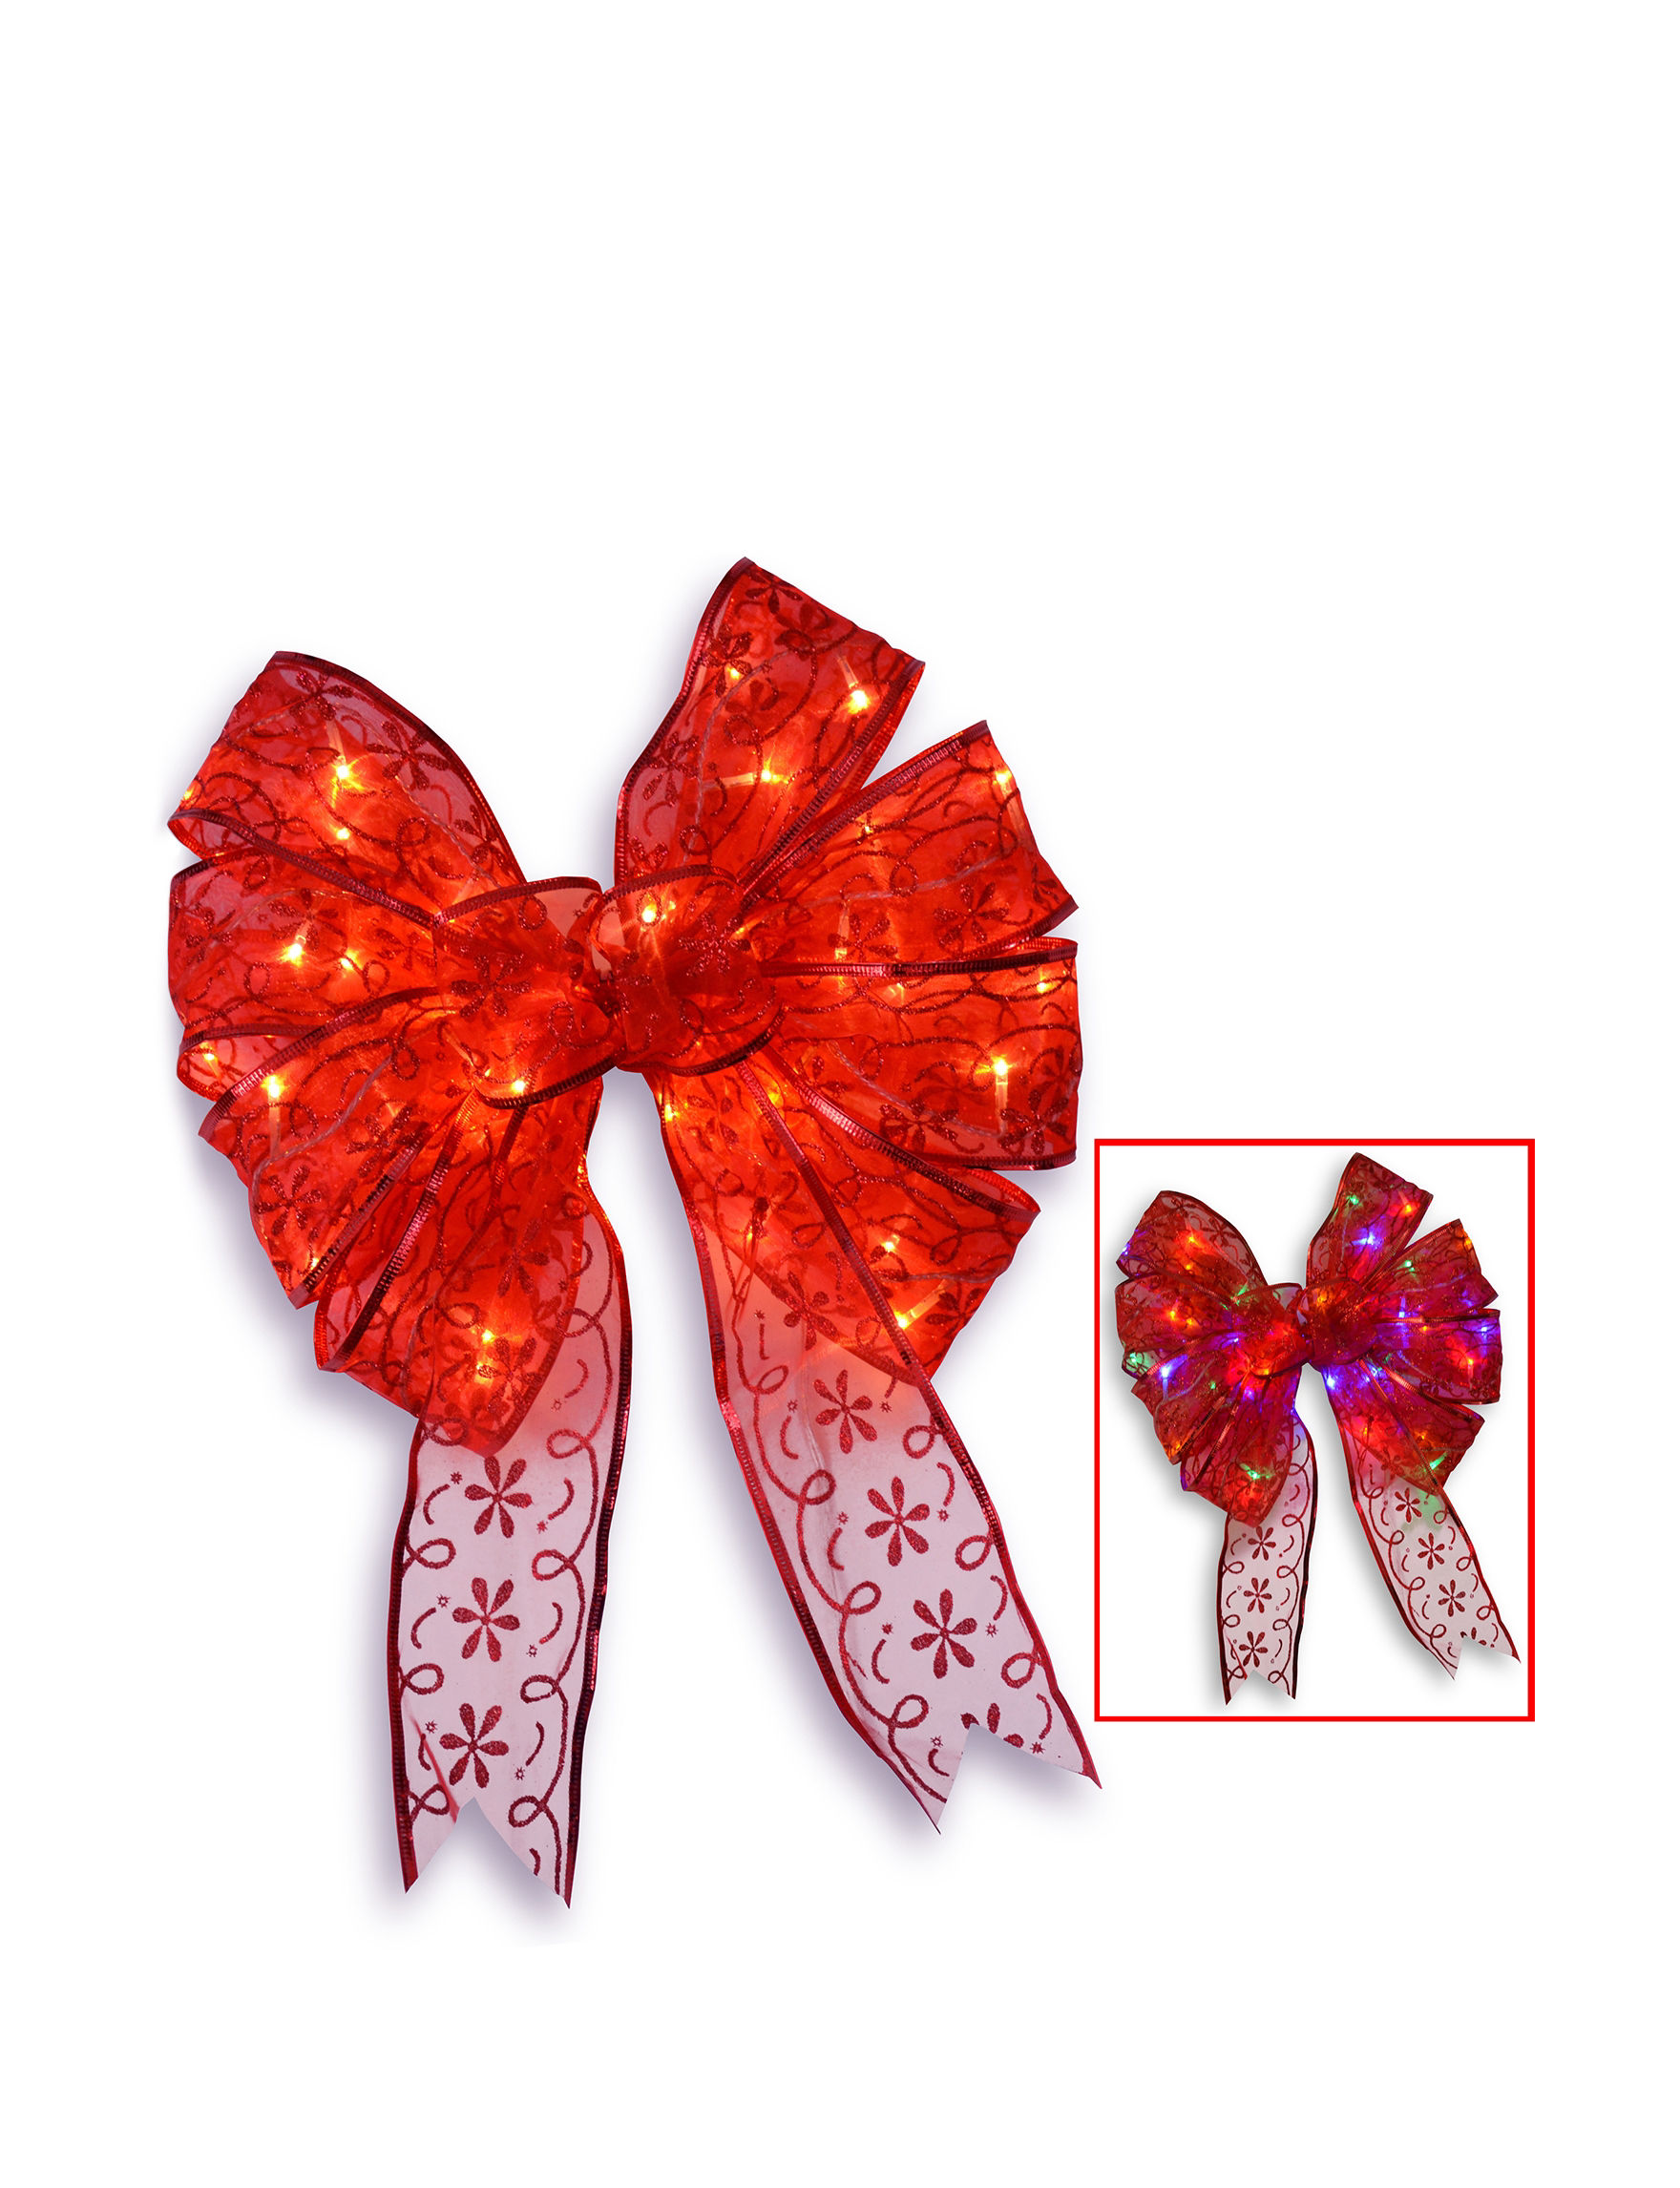 National Tree Company Red Decorative Objects Holiday Decor